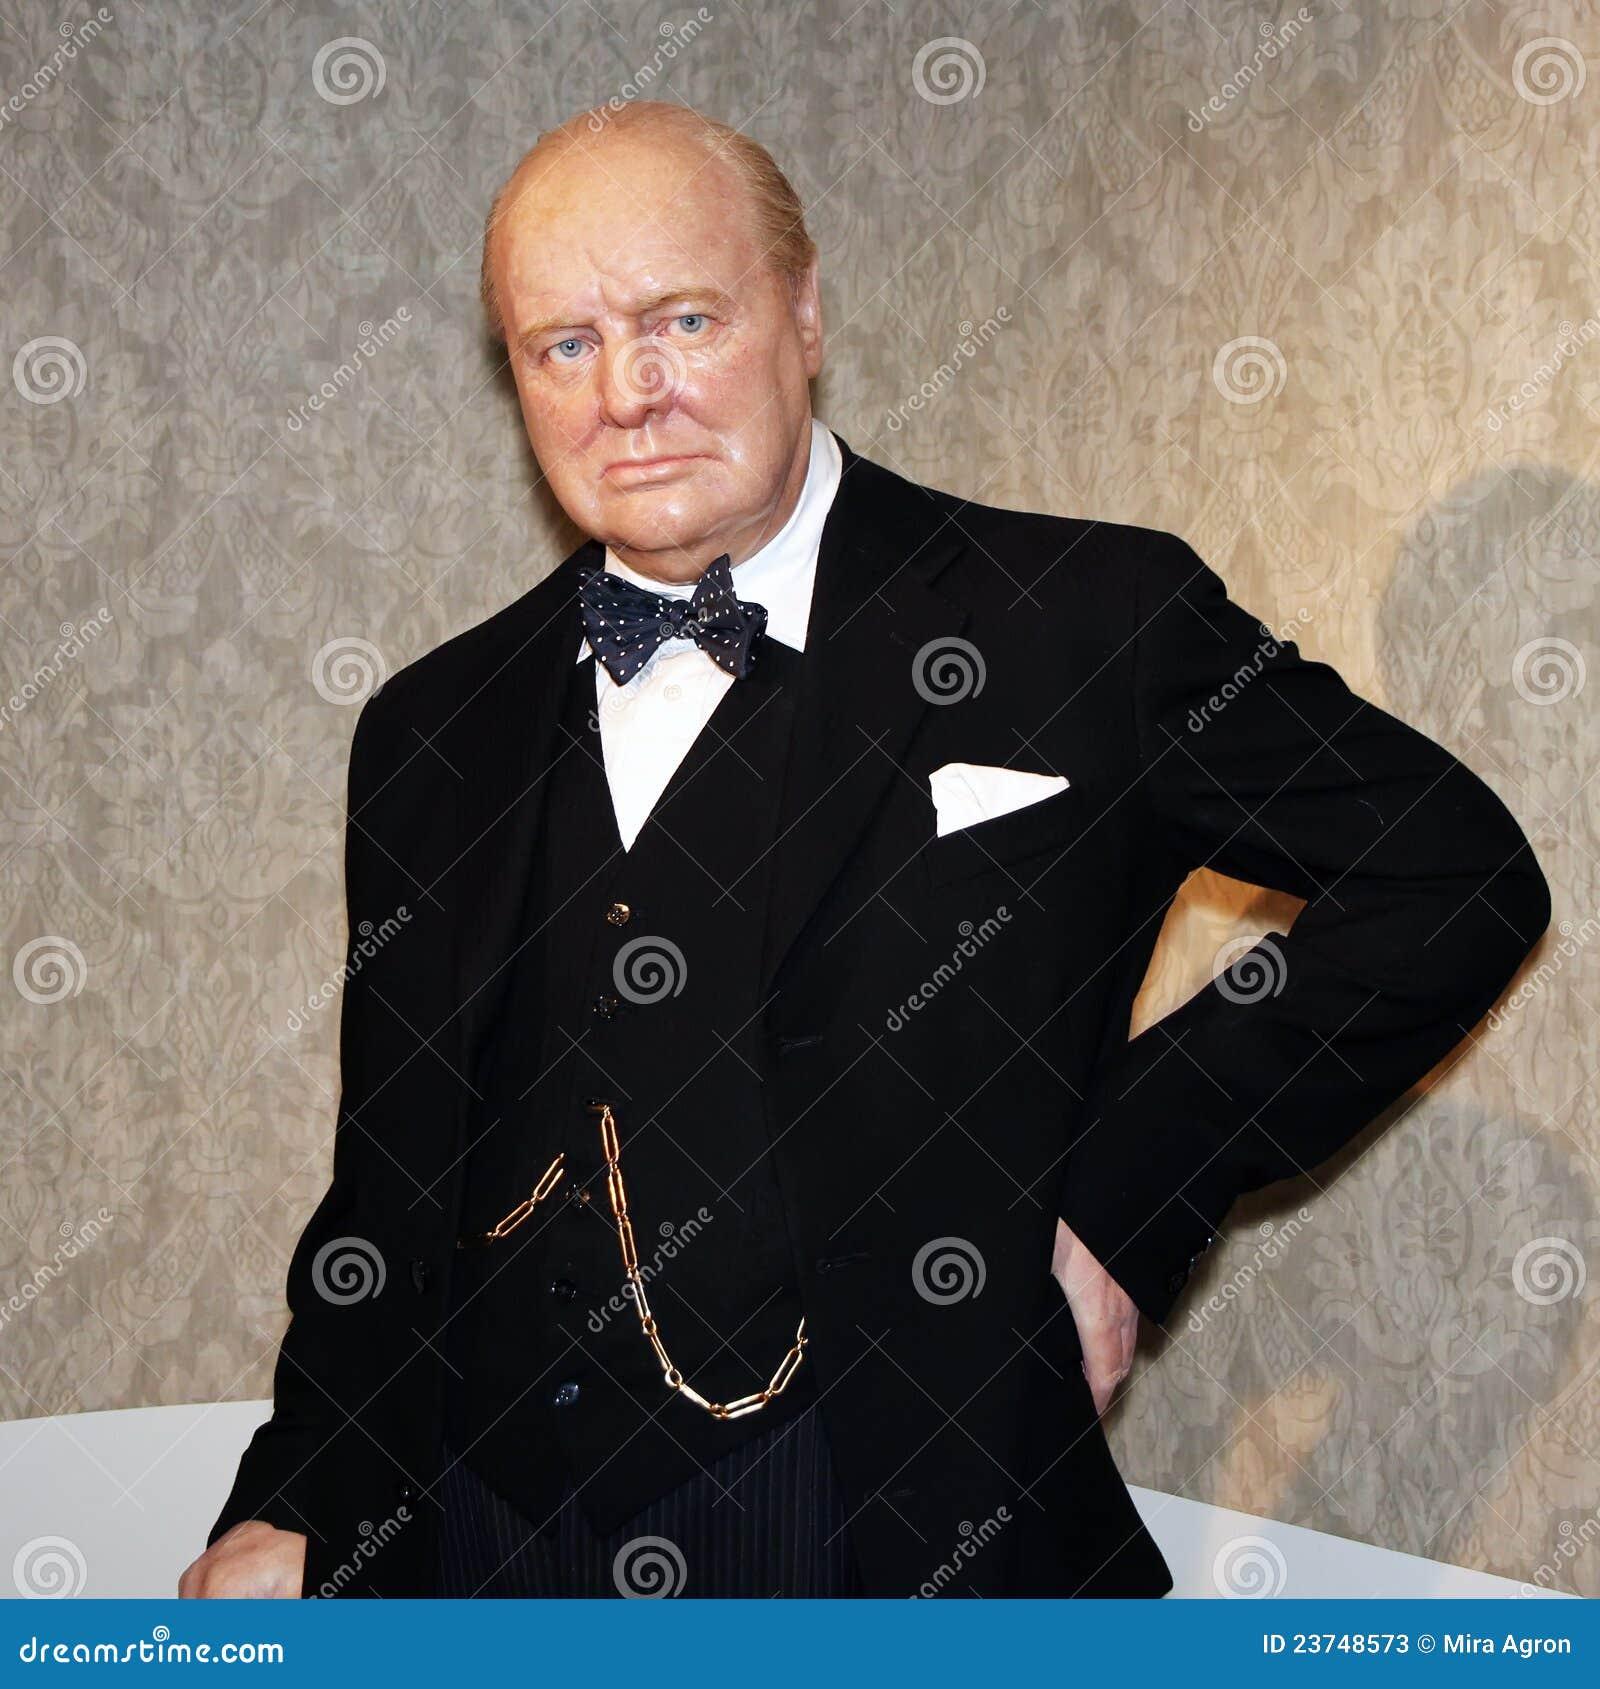 Churchill winston